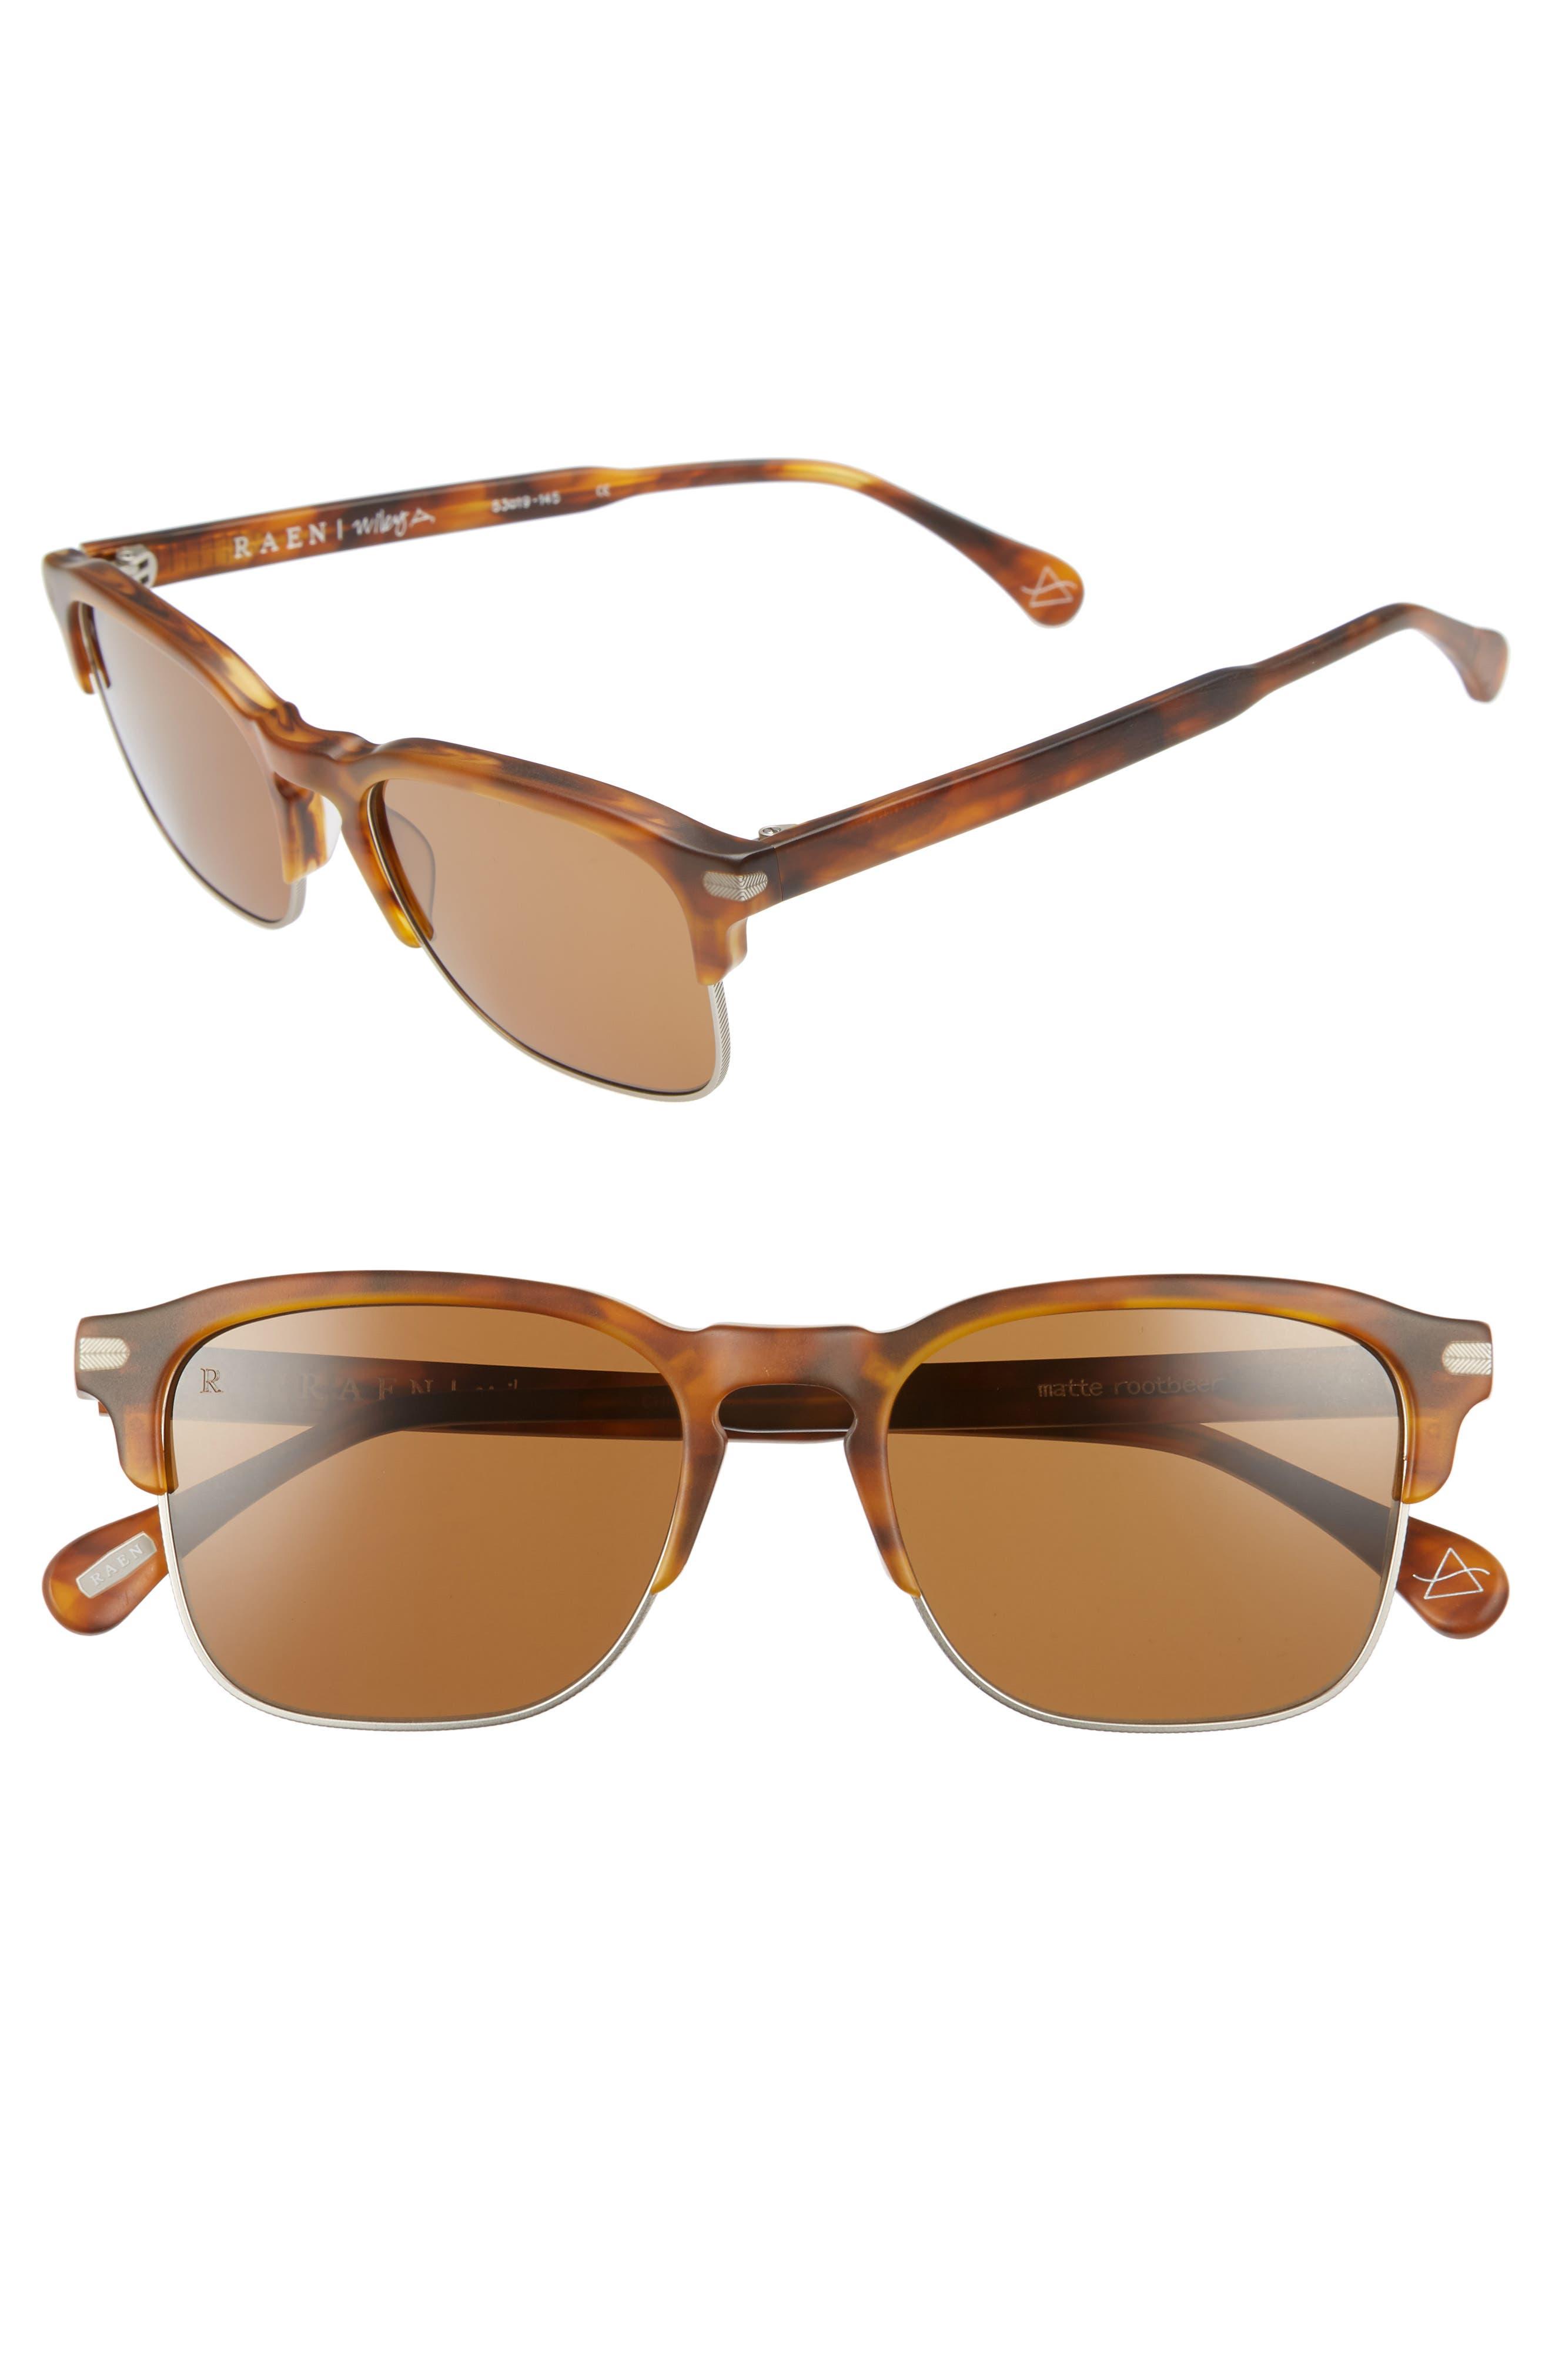 Wiley A 53mm Sunglasses,                             Main thumbnail 1, color,                             AMERICANO